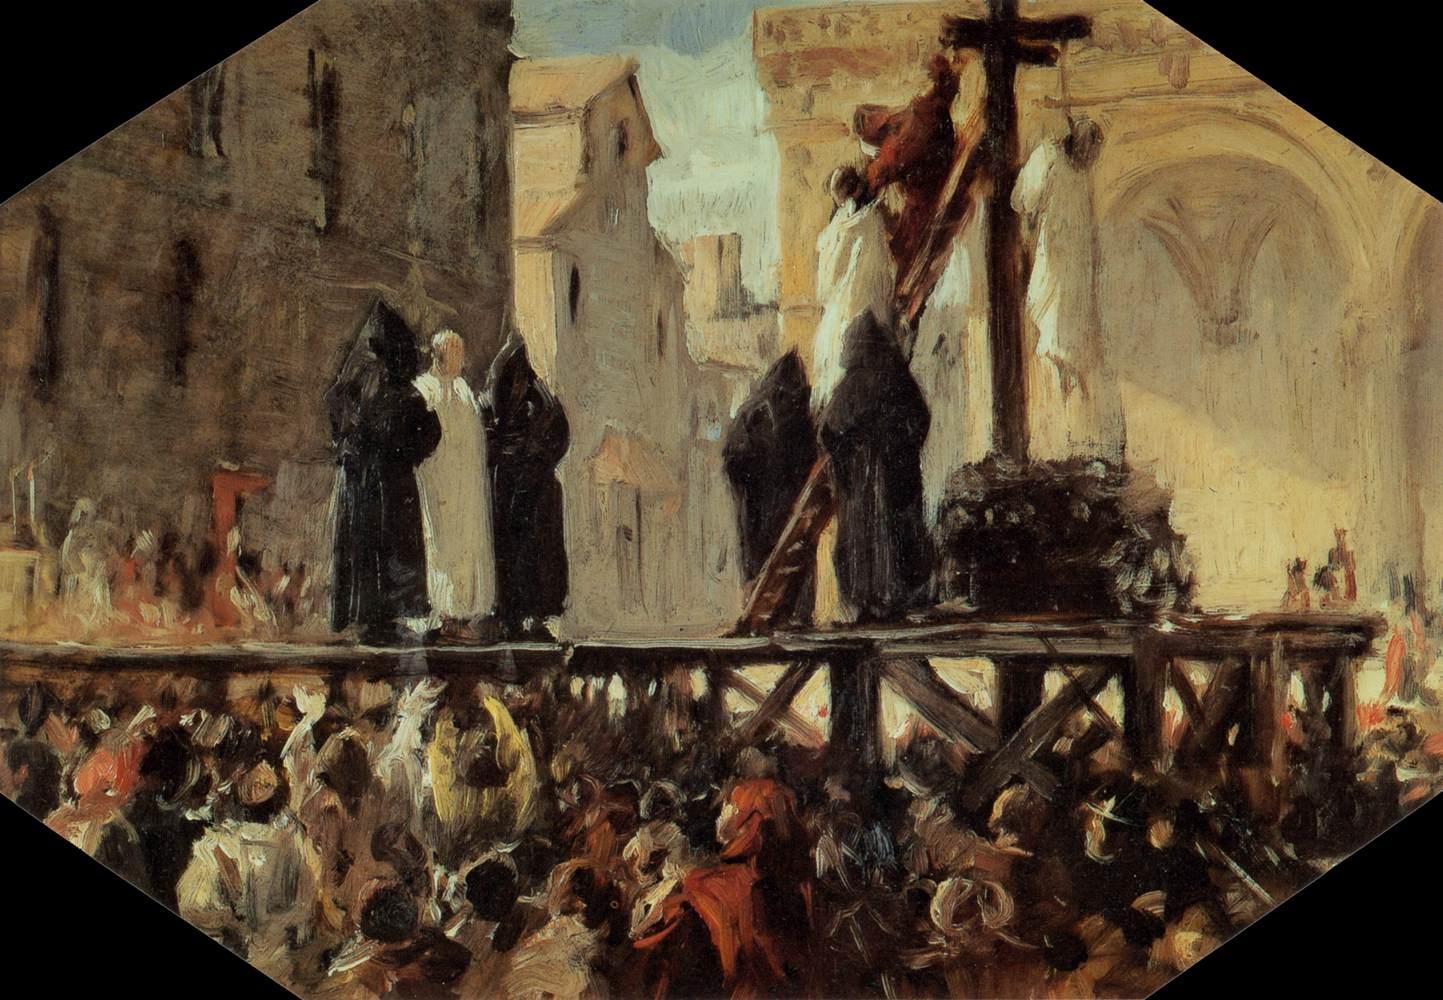 Stefano Ussi, The Execution of Savonarola, Oil sketch on glass, 41 x 45 cm, Galleria Palatina (Palazzo Pitti), Florence